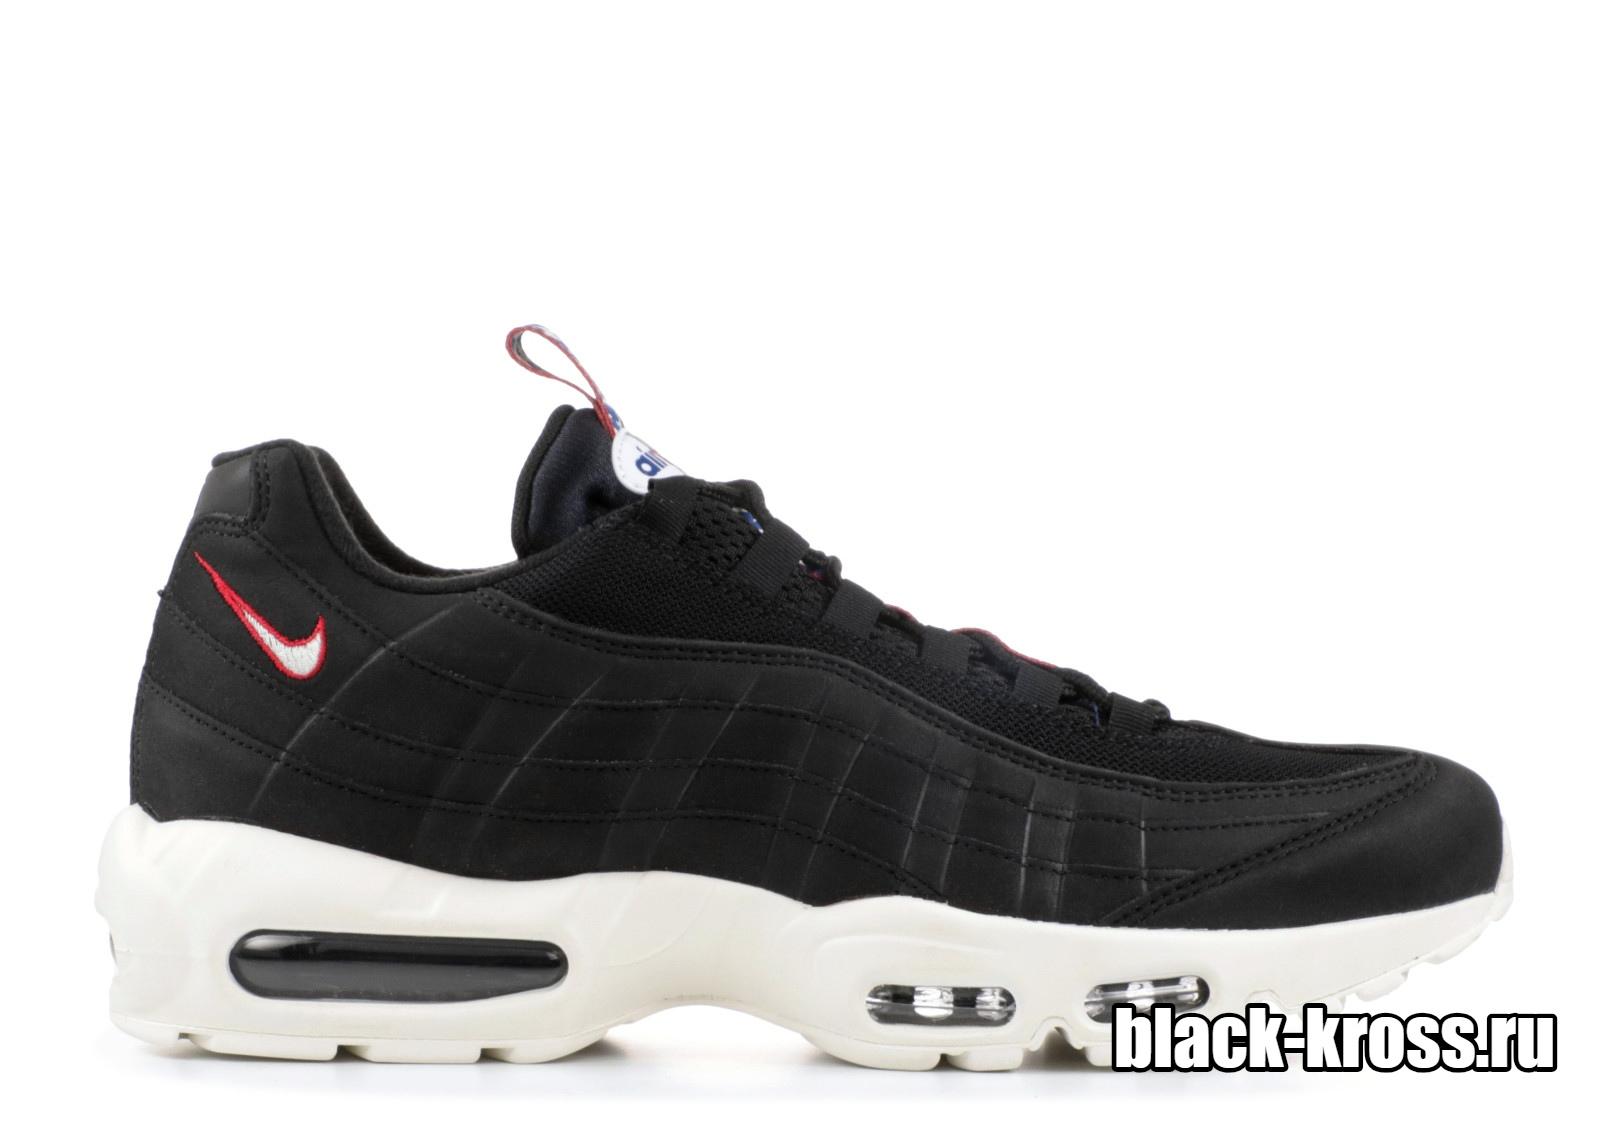 Nike Air Max 95 «Pull Tabs» Black/White (41-46)